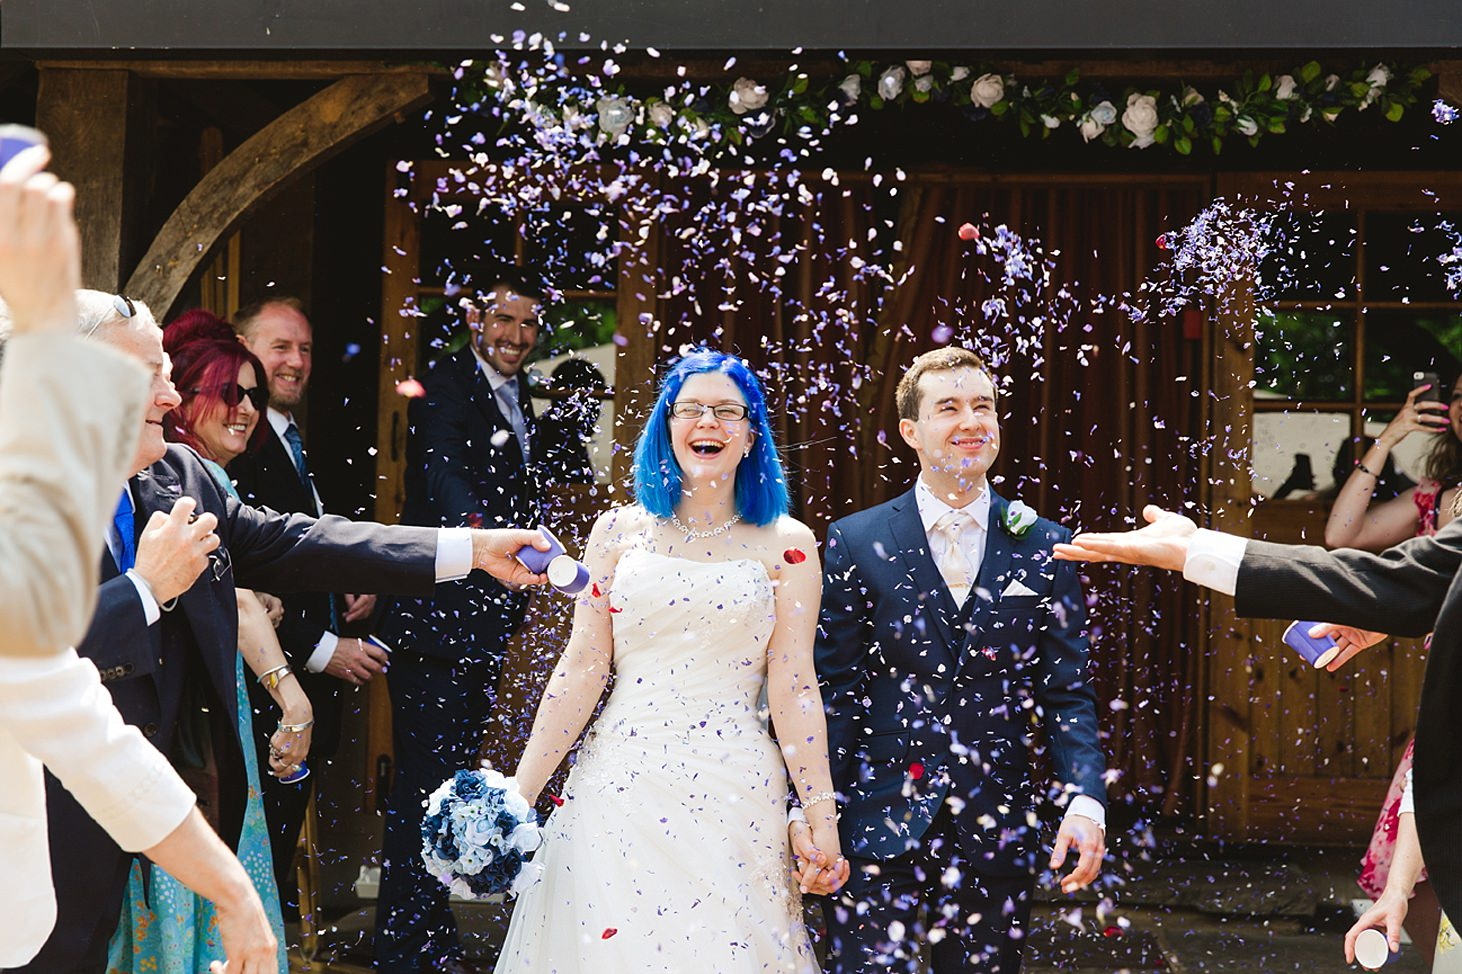 gate street barn wedding photography bride and groom in confetti